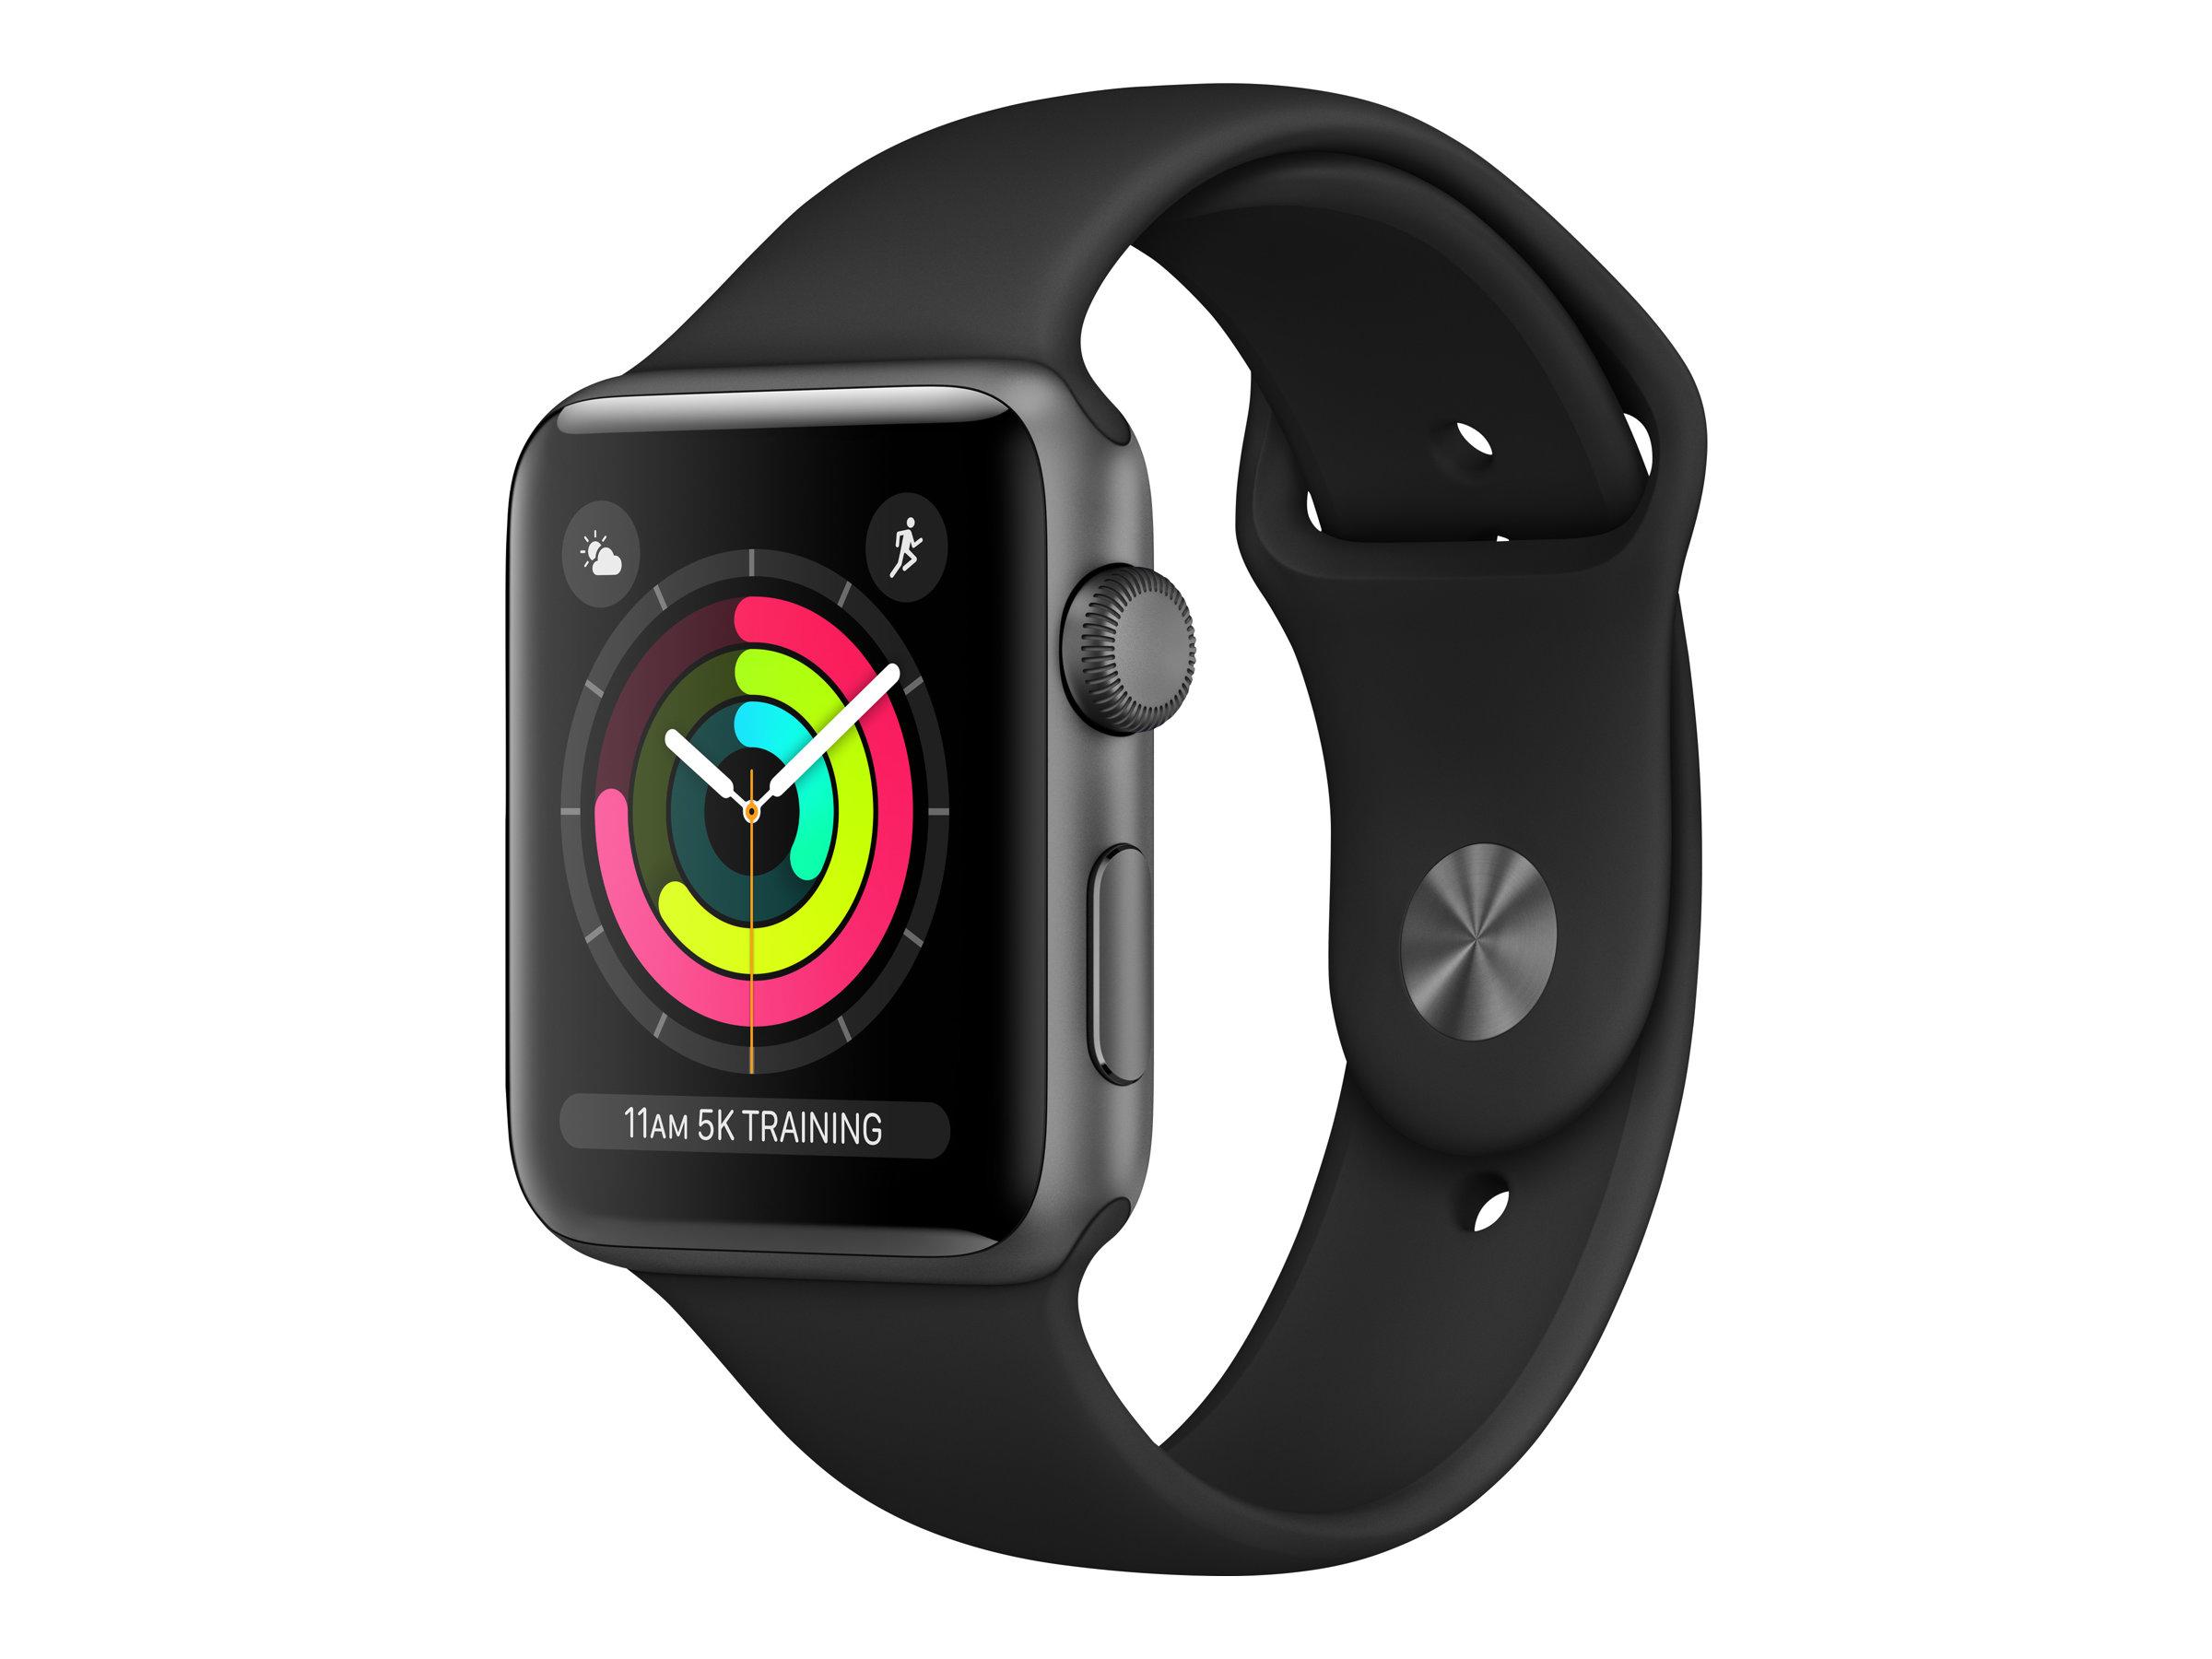 Apple Watch Series 3 (GPS) - 38 mm - Weltraum grau Aluminium